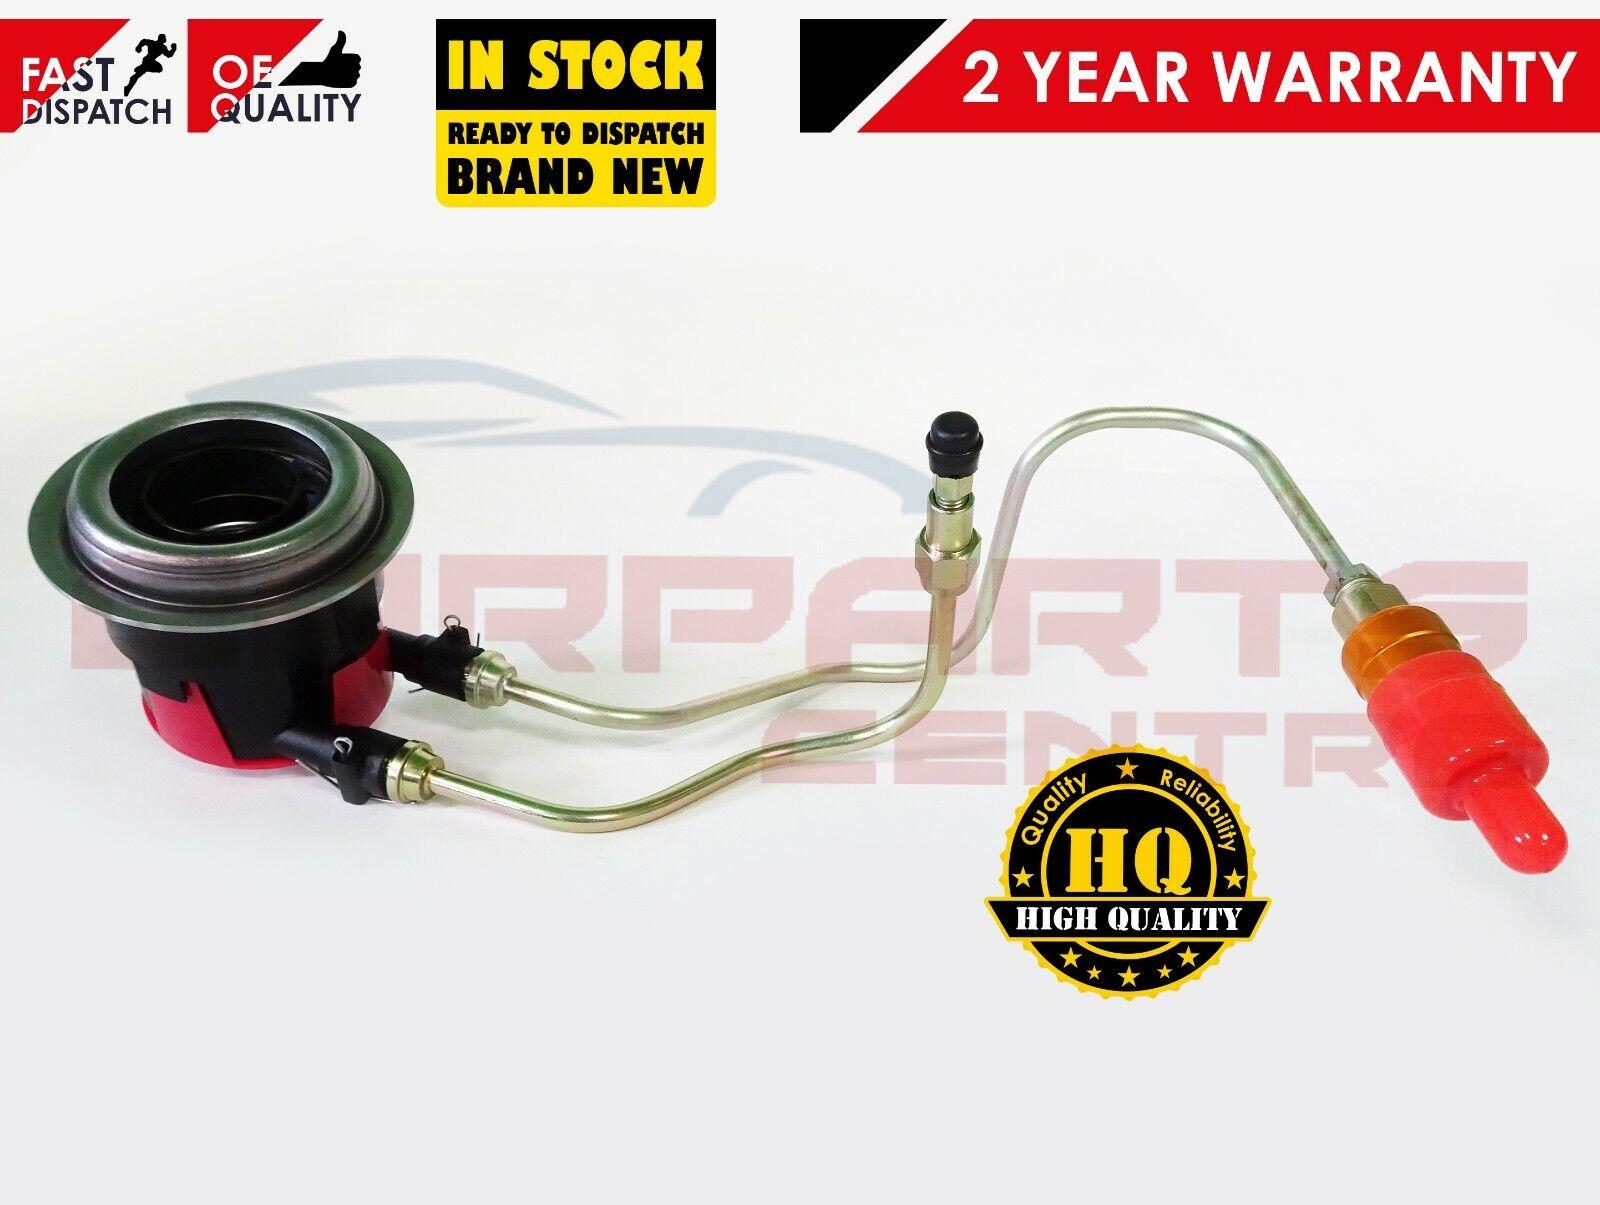 Rover 75 MGZT 2.0 TD4 CDTI Diesel clutch hydraulic concentric cylinder bearing